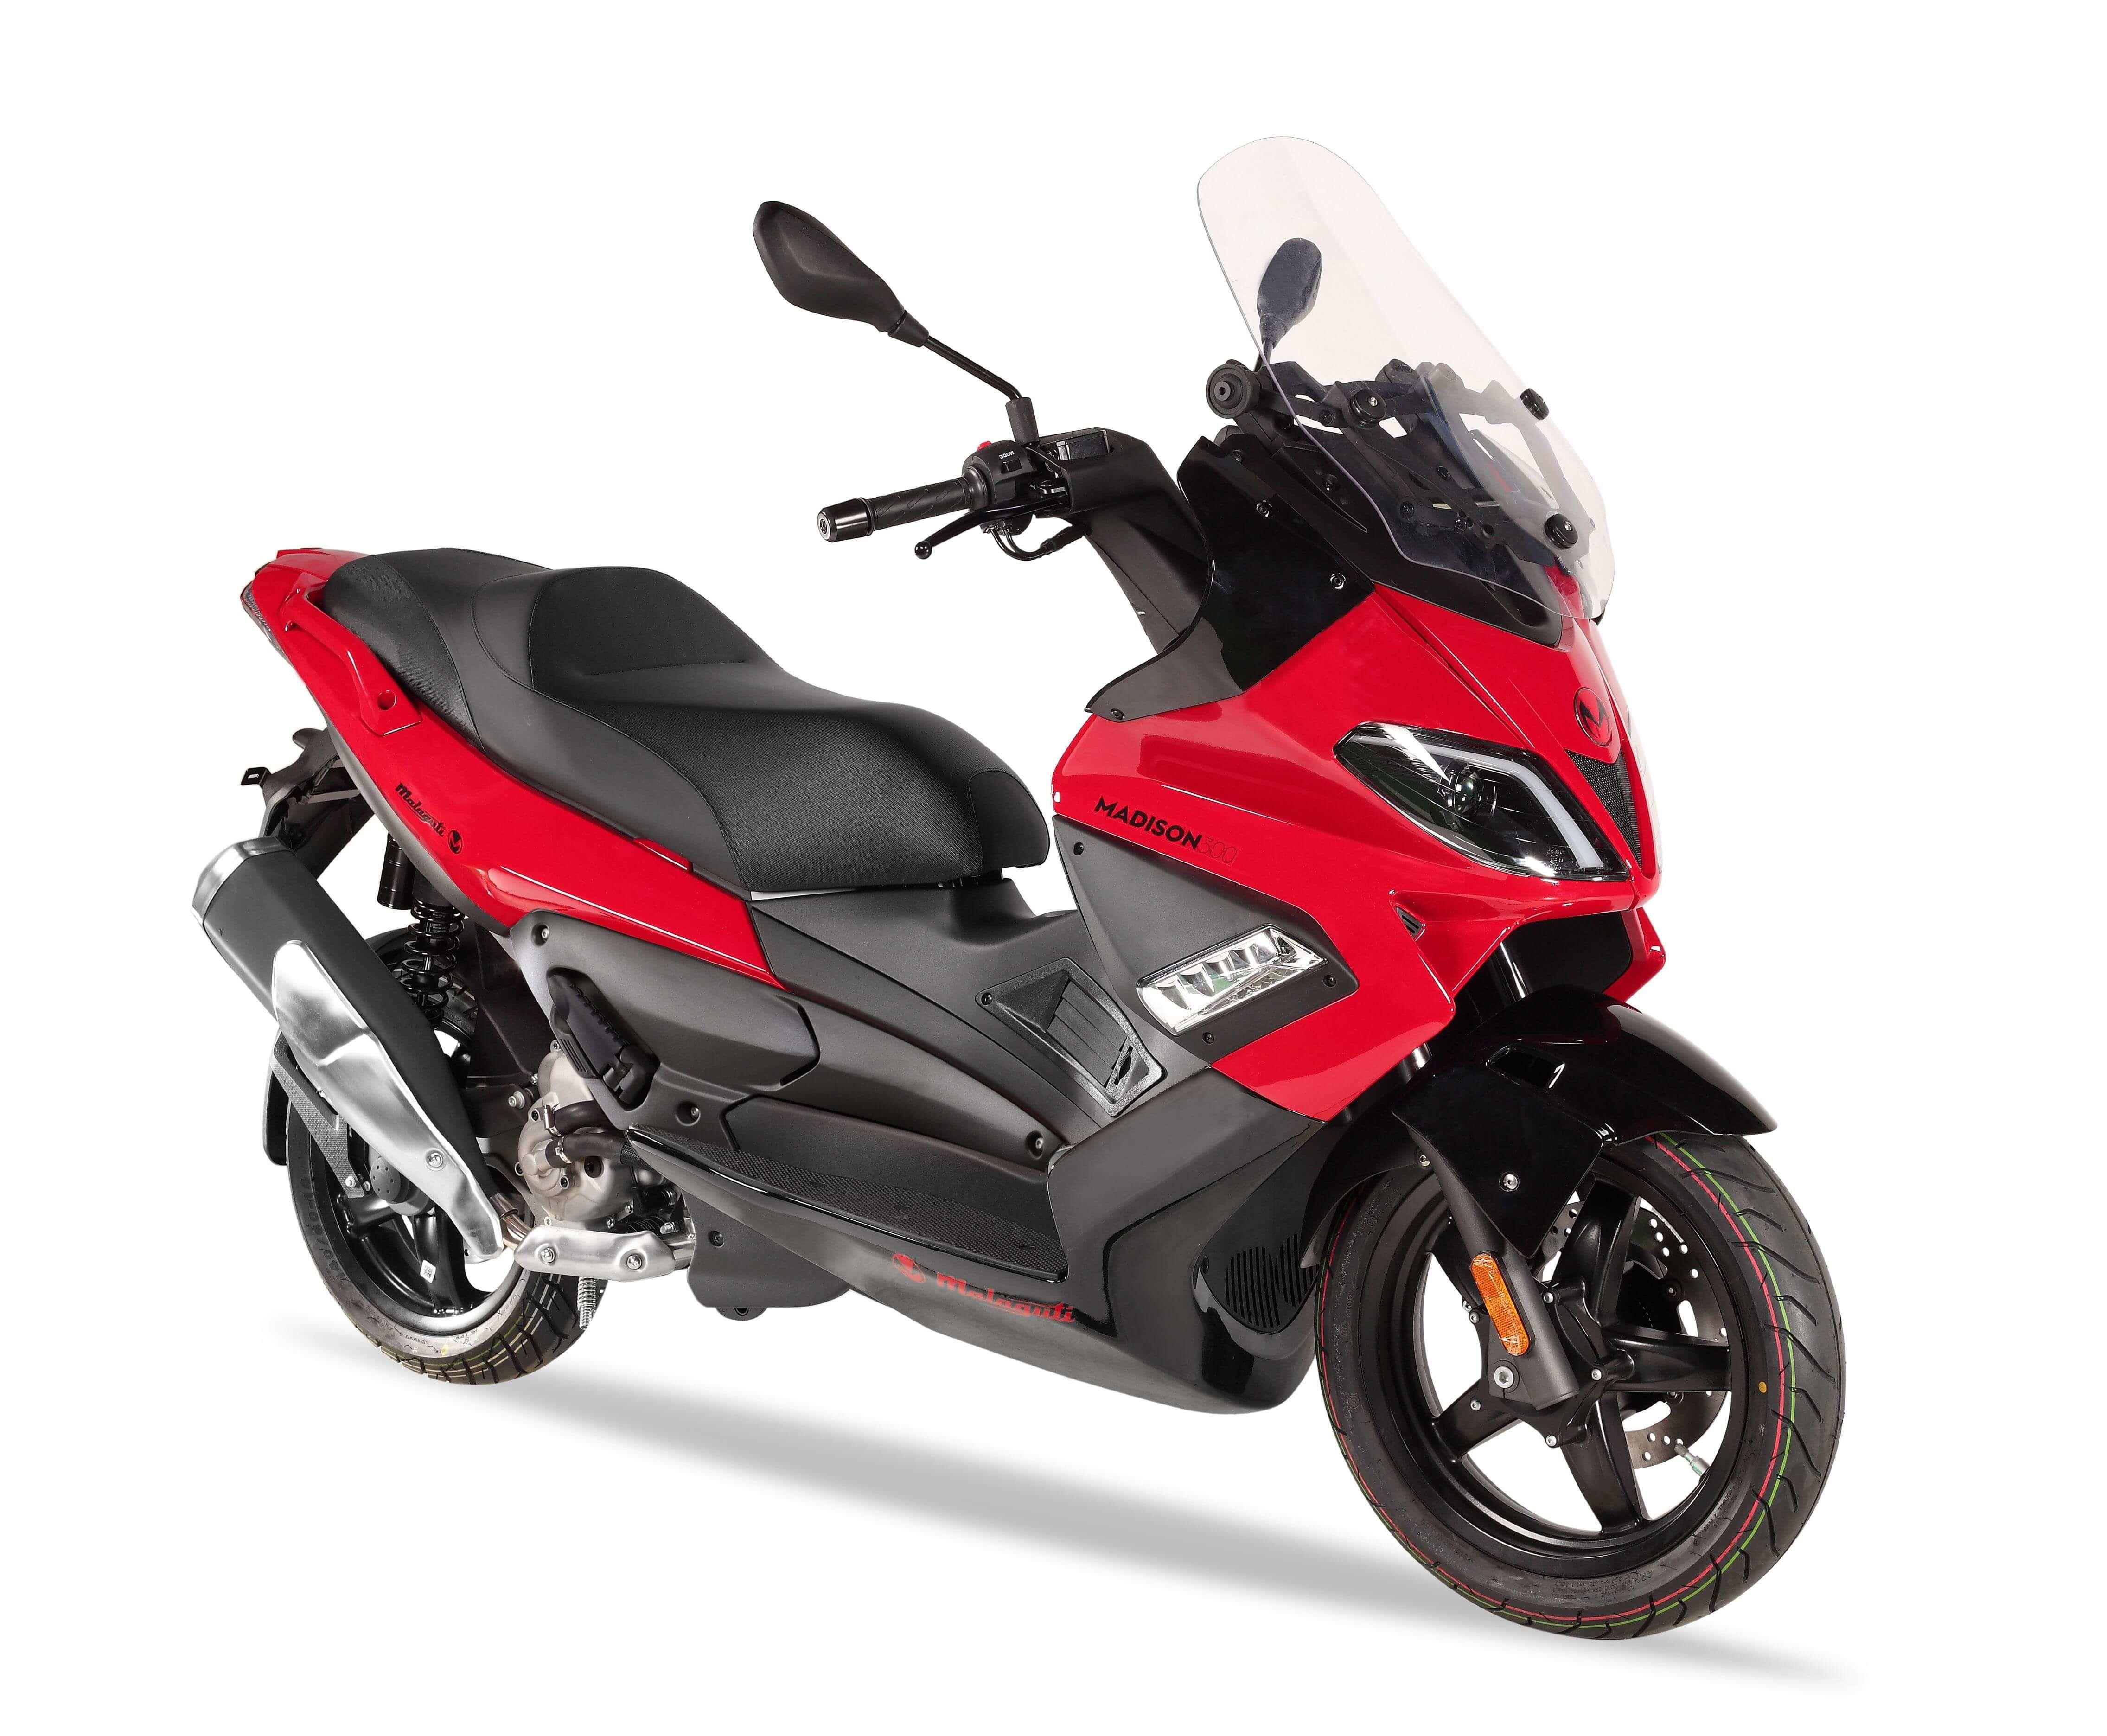 malaguti-model-madison-300